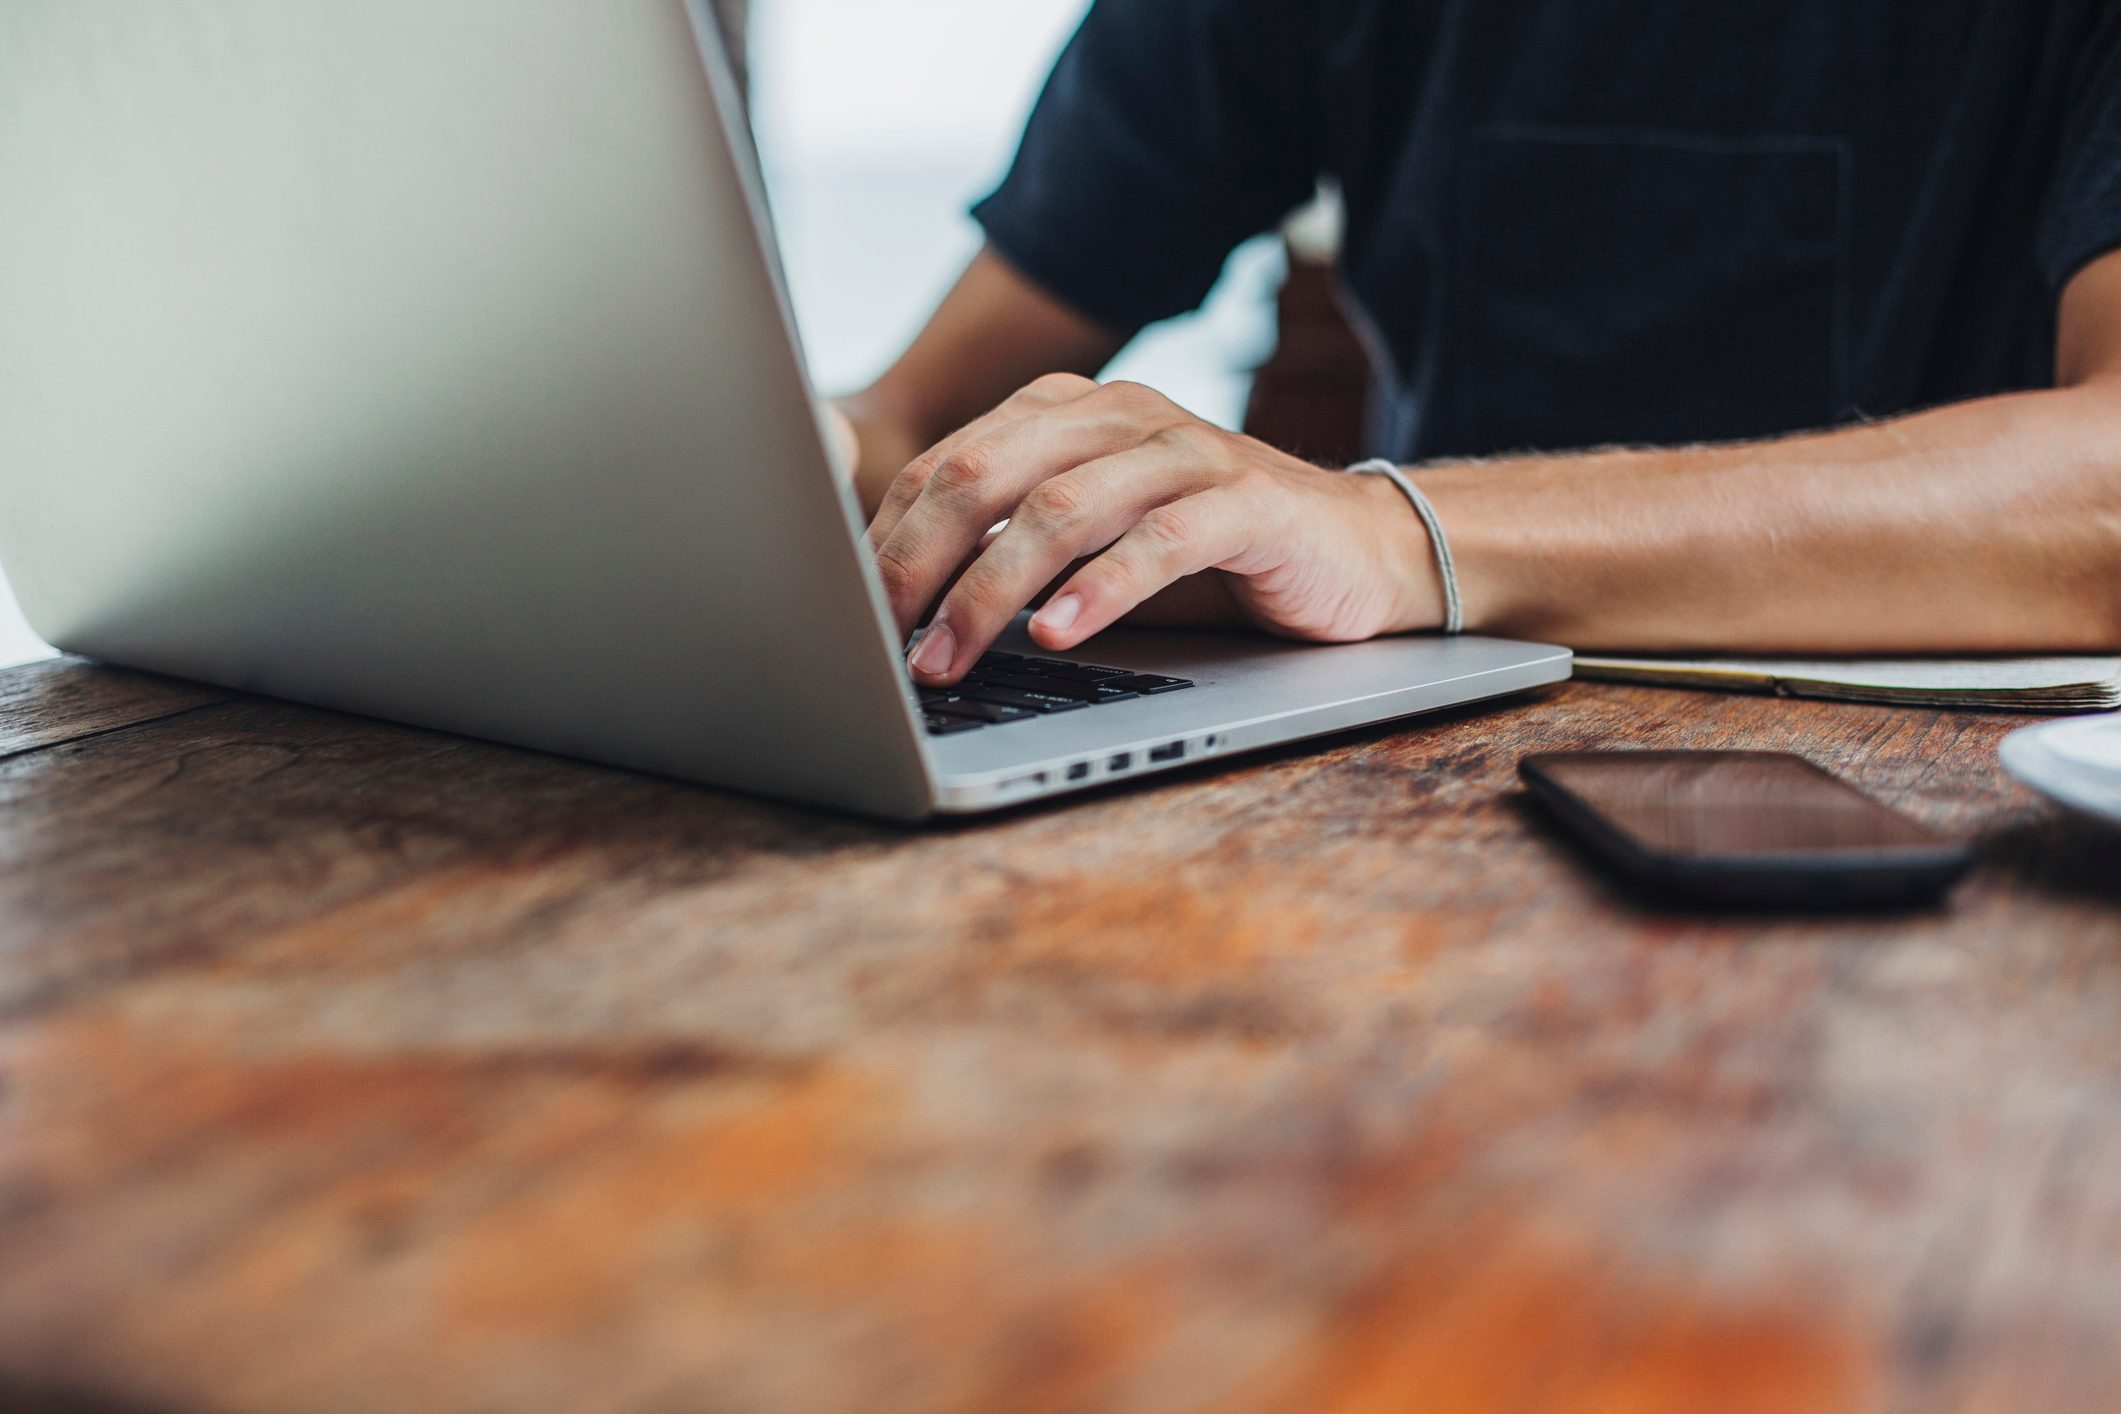 Caucasian man using laptop at table